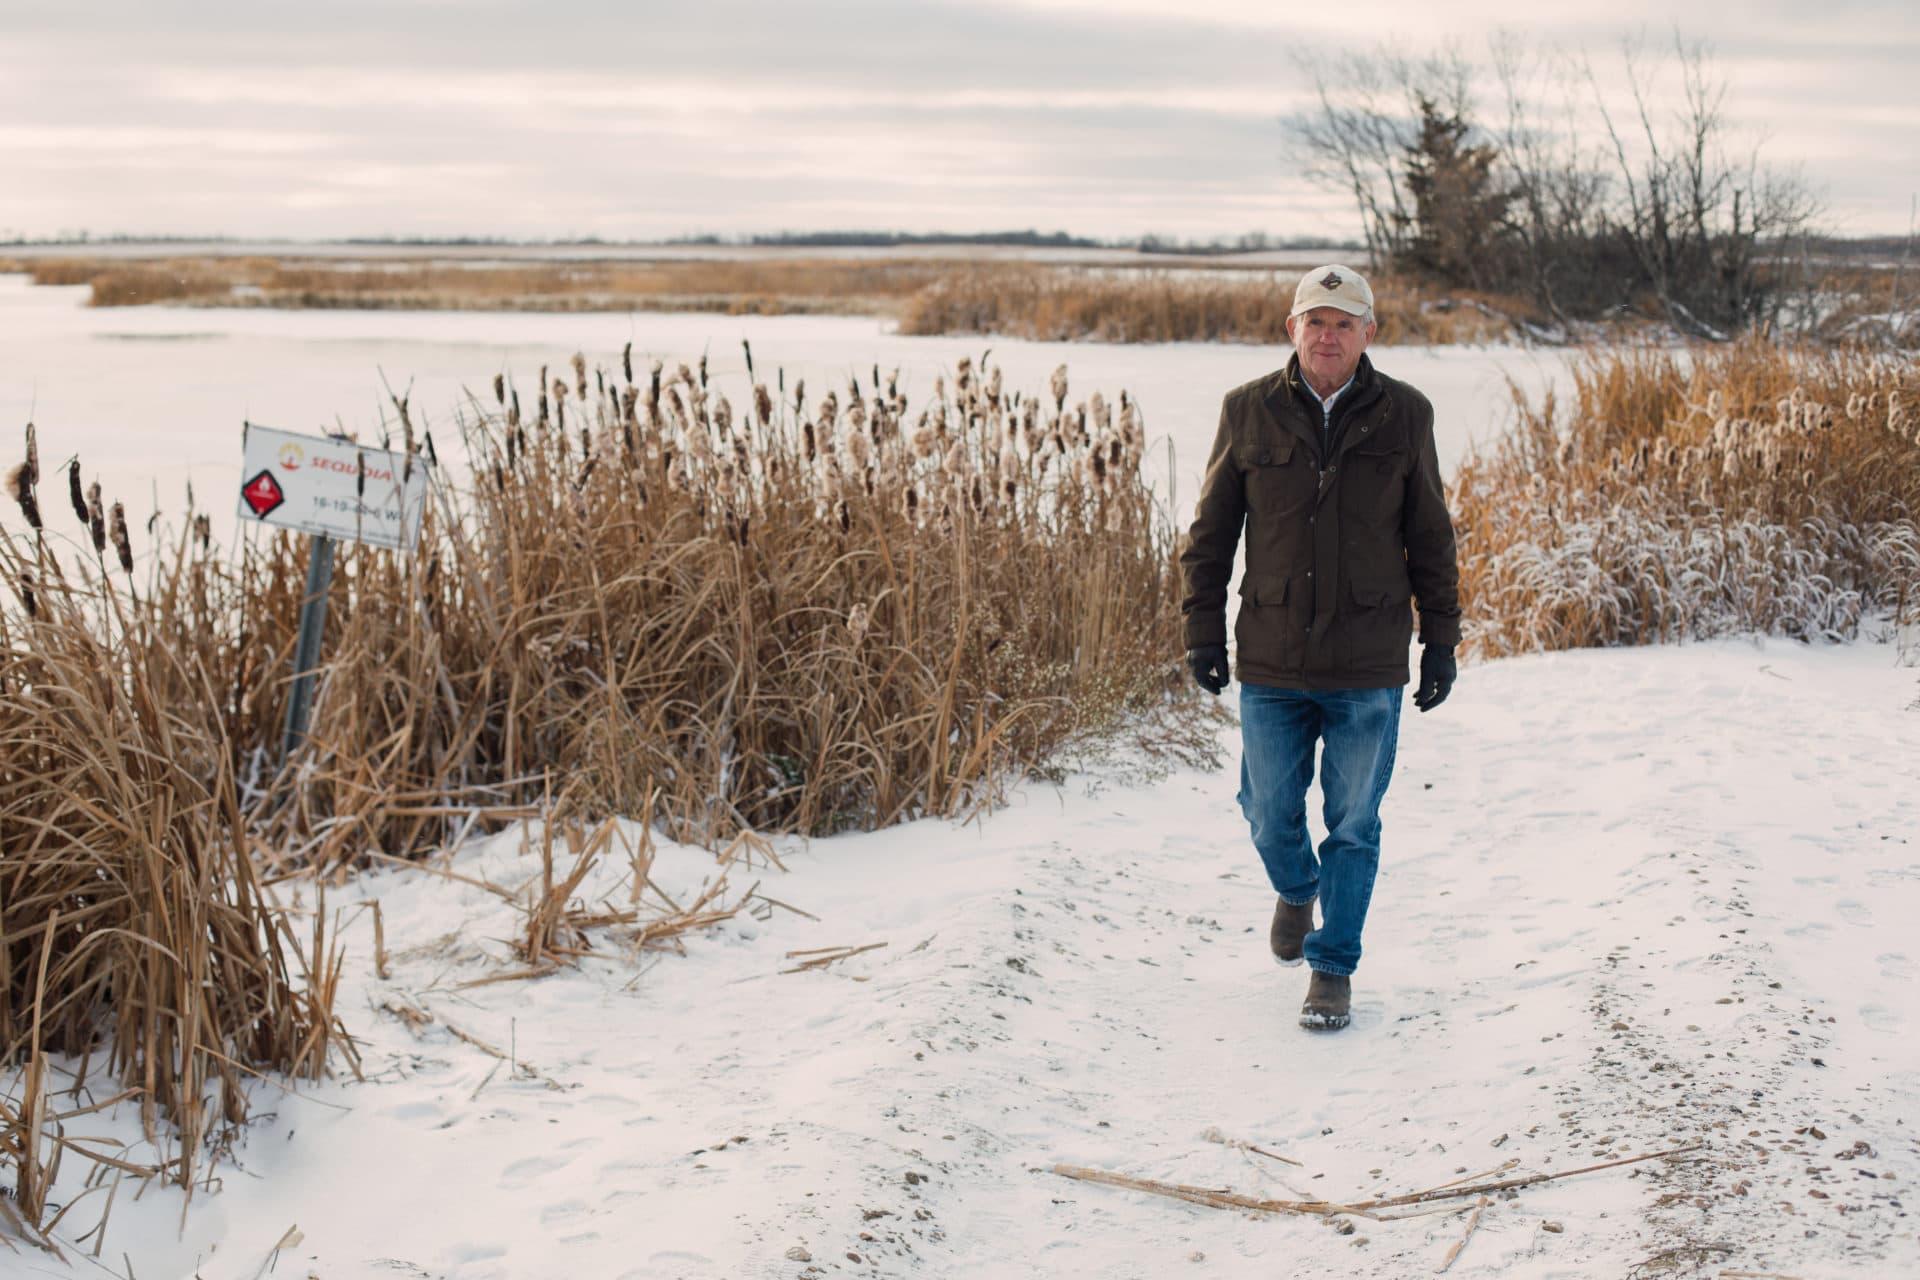 Mike Smith in Wainwright, Alberta on Monday, November 5, 2018. Amber Bracken